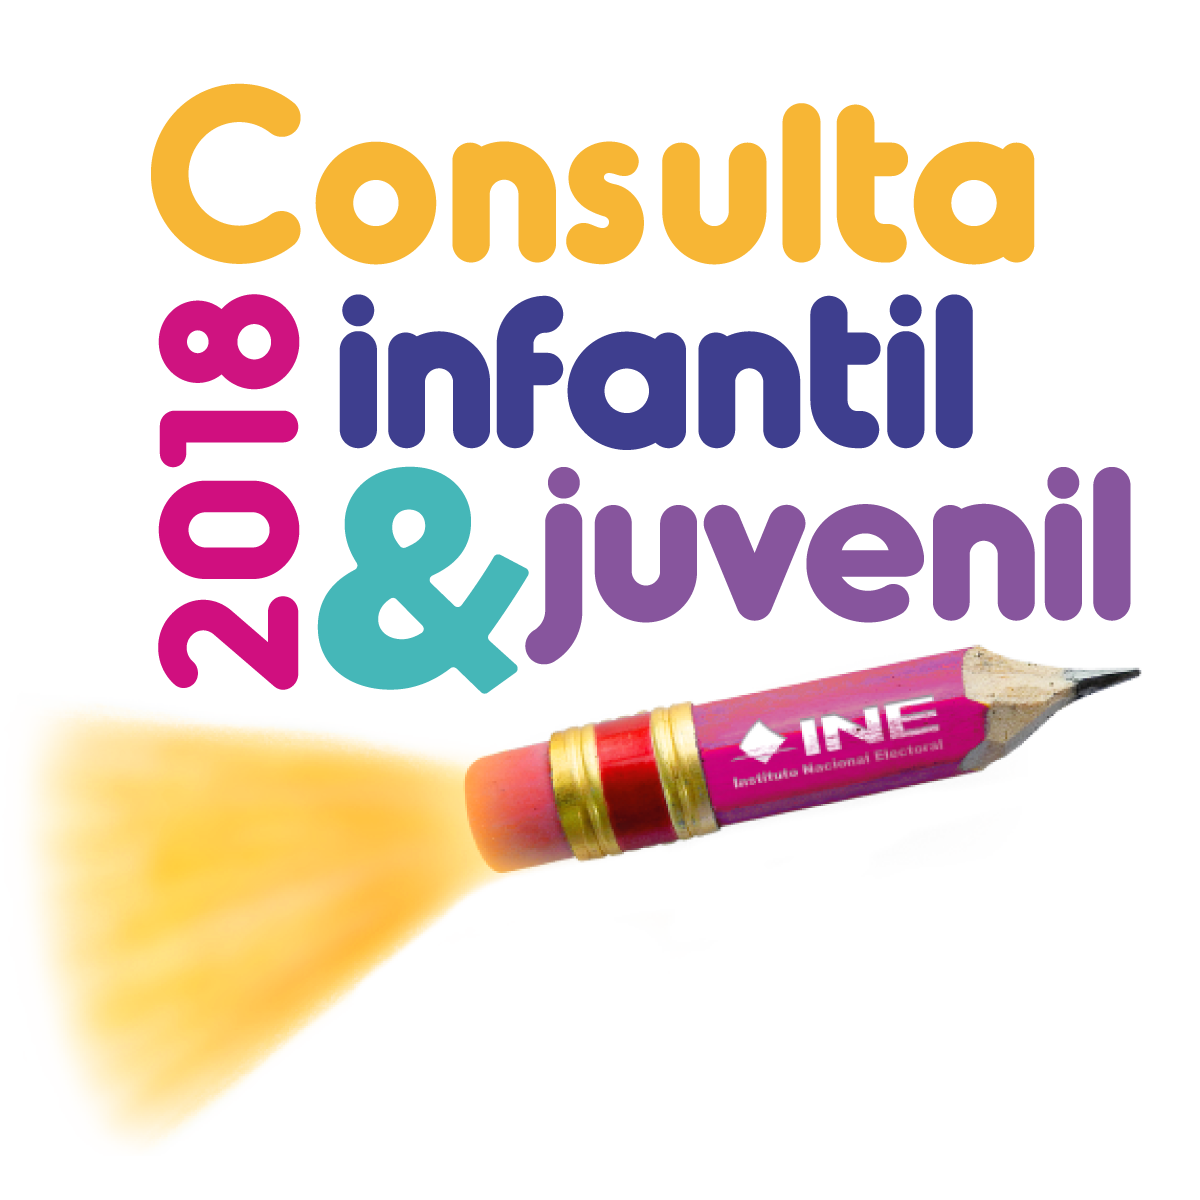 Logo Consulta infantil y juvenil 2018